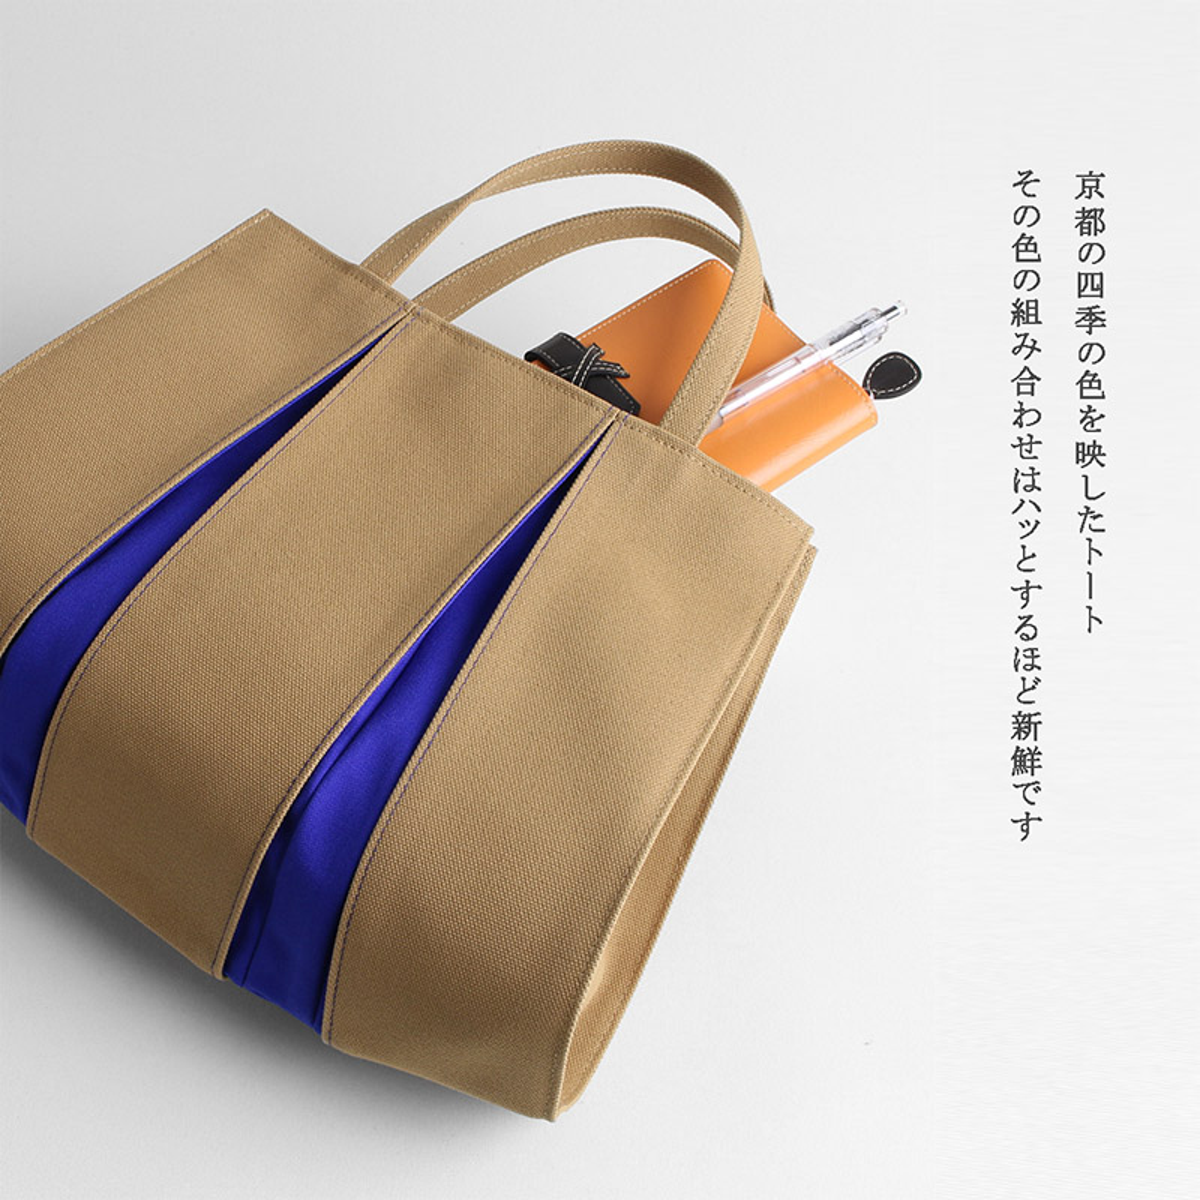 KOSHO  ougi  帆布 トートバッグ PH